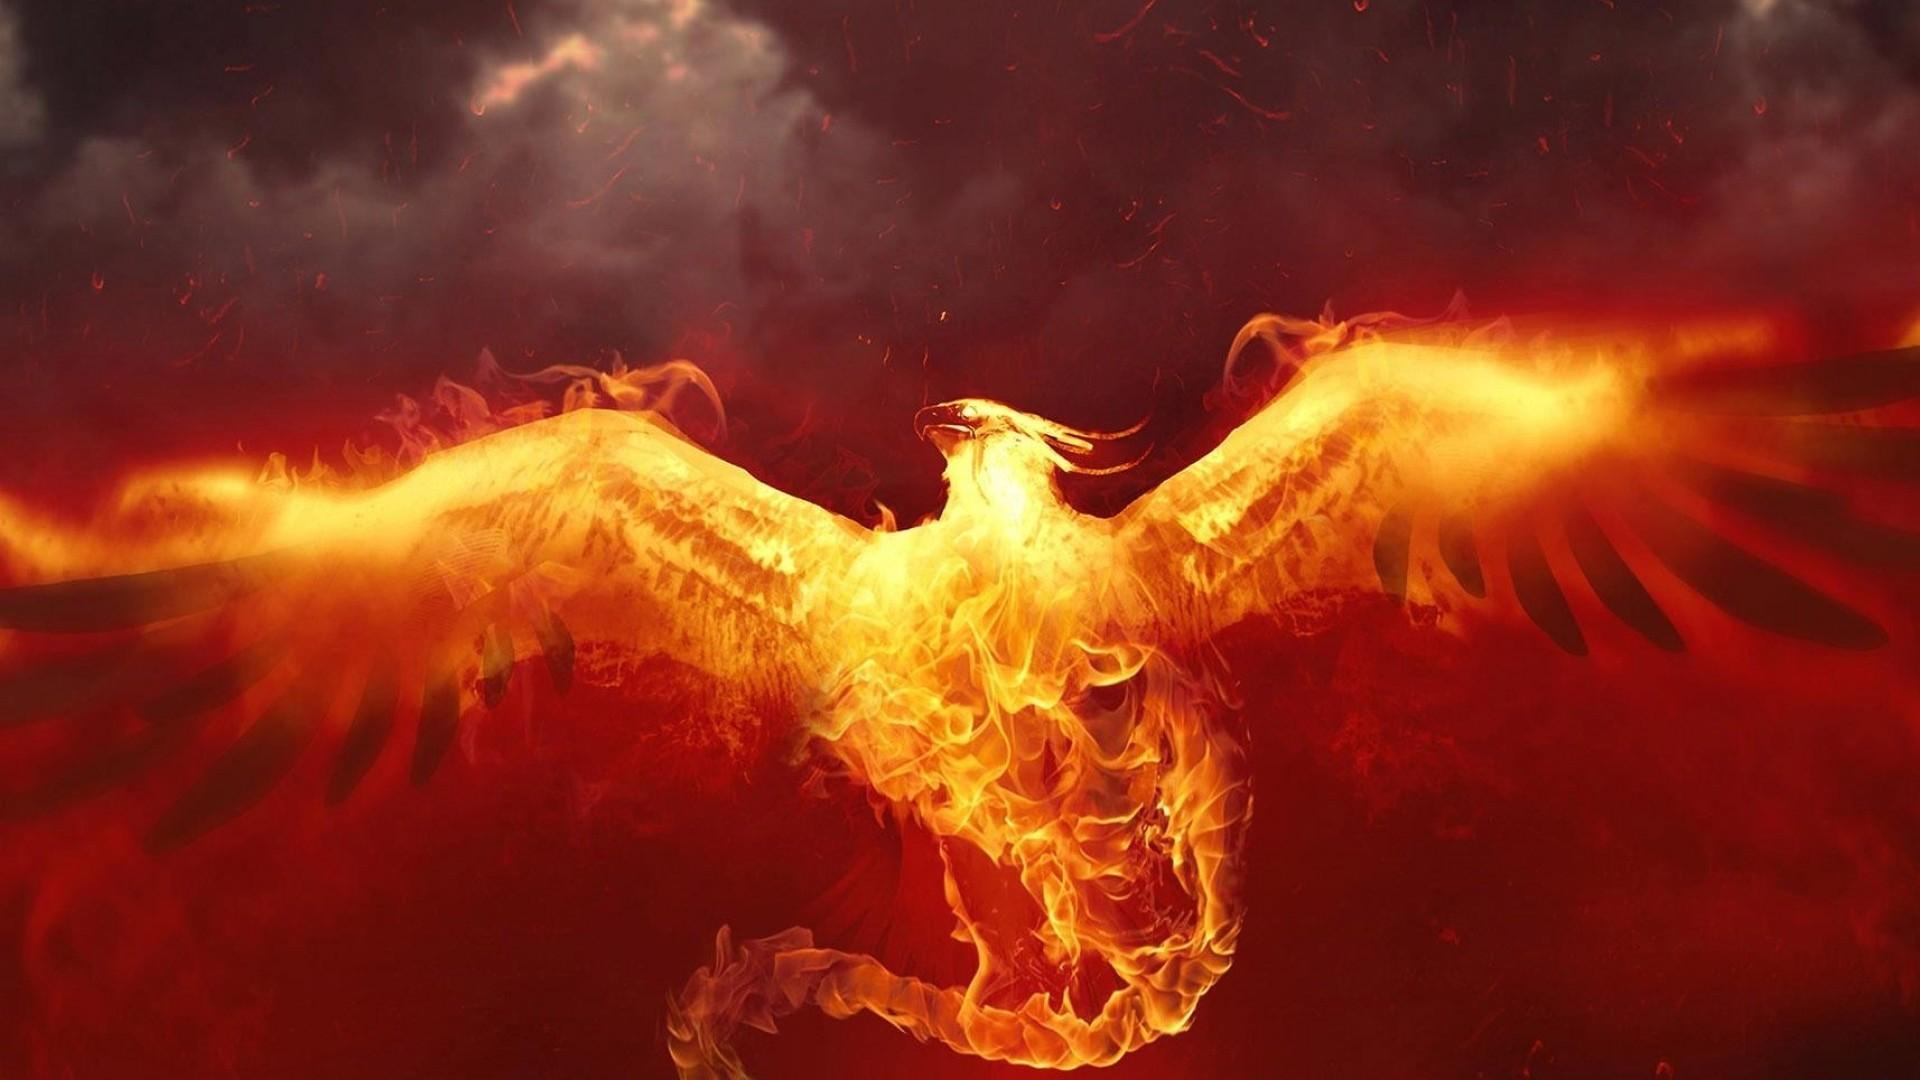 phoenix wallpaper hd - photo #17